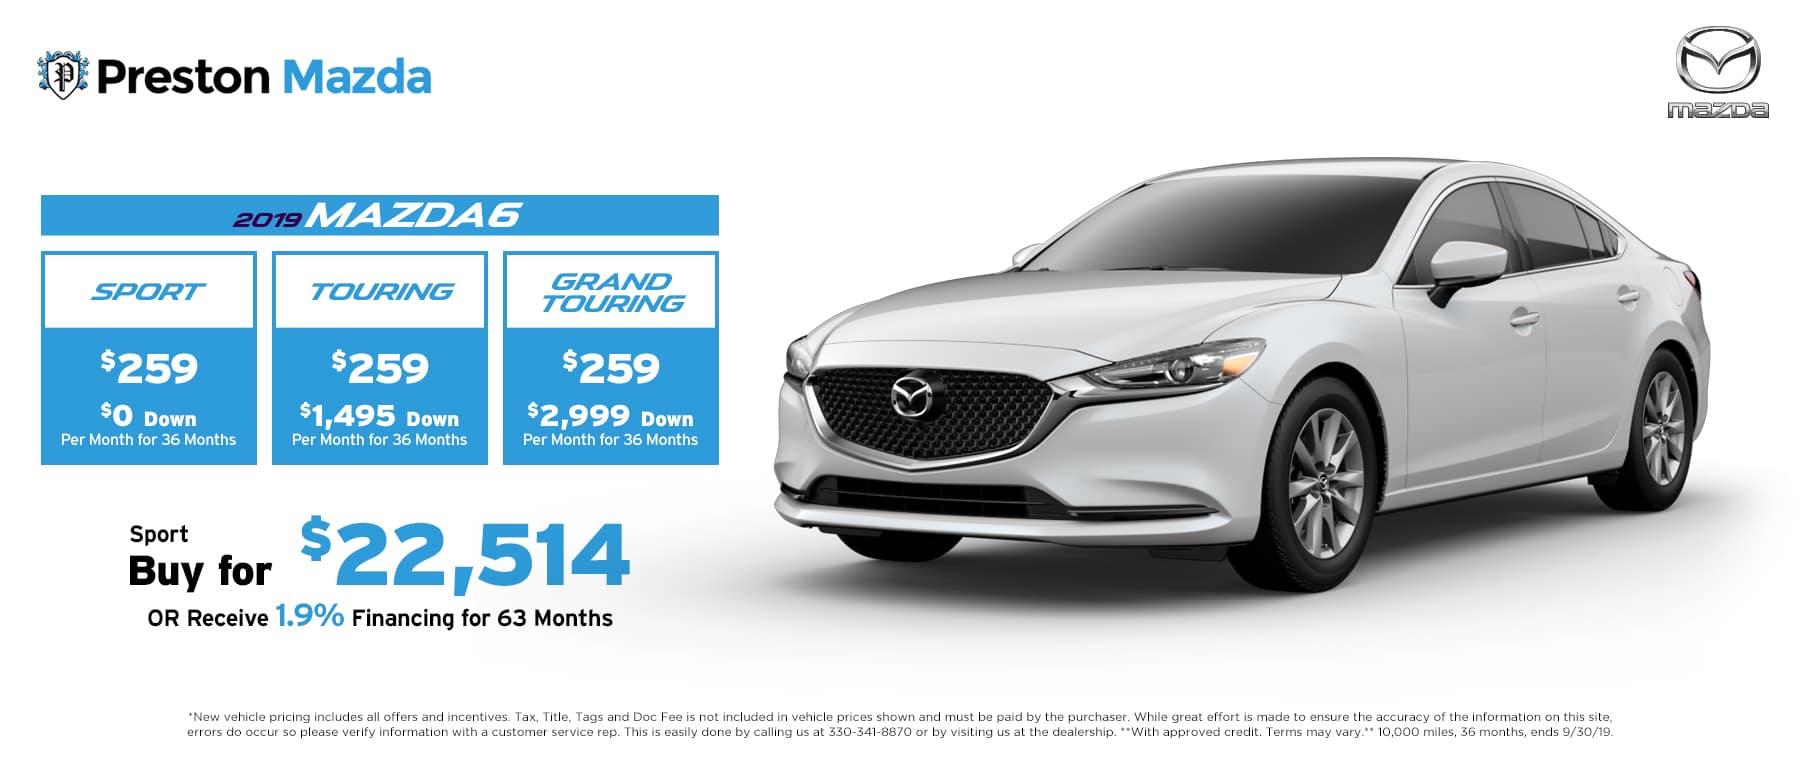 September special on the 2019 Mazda6